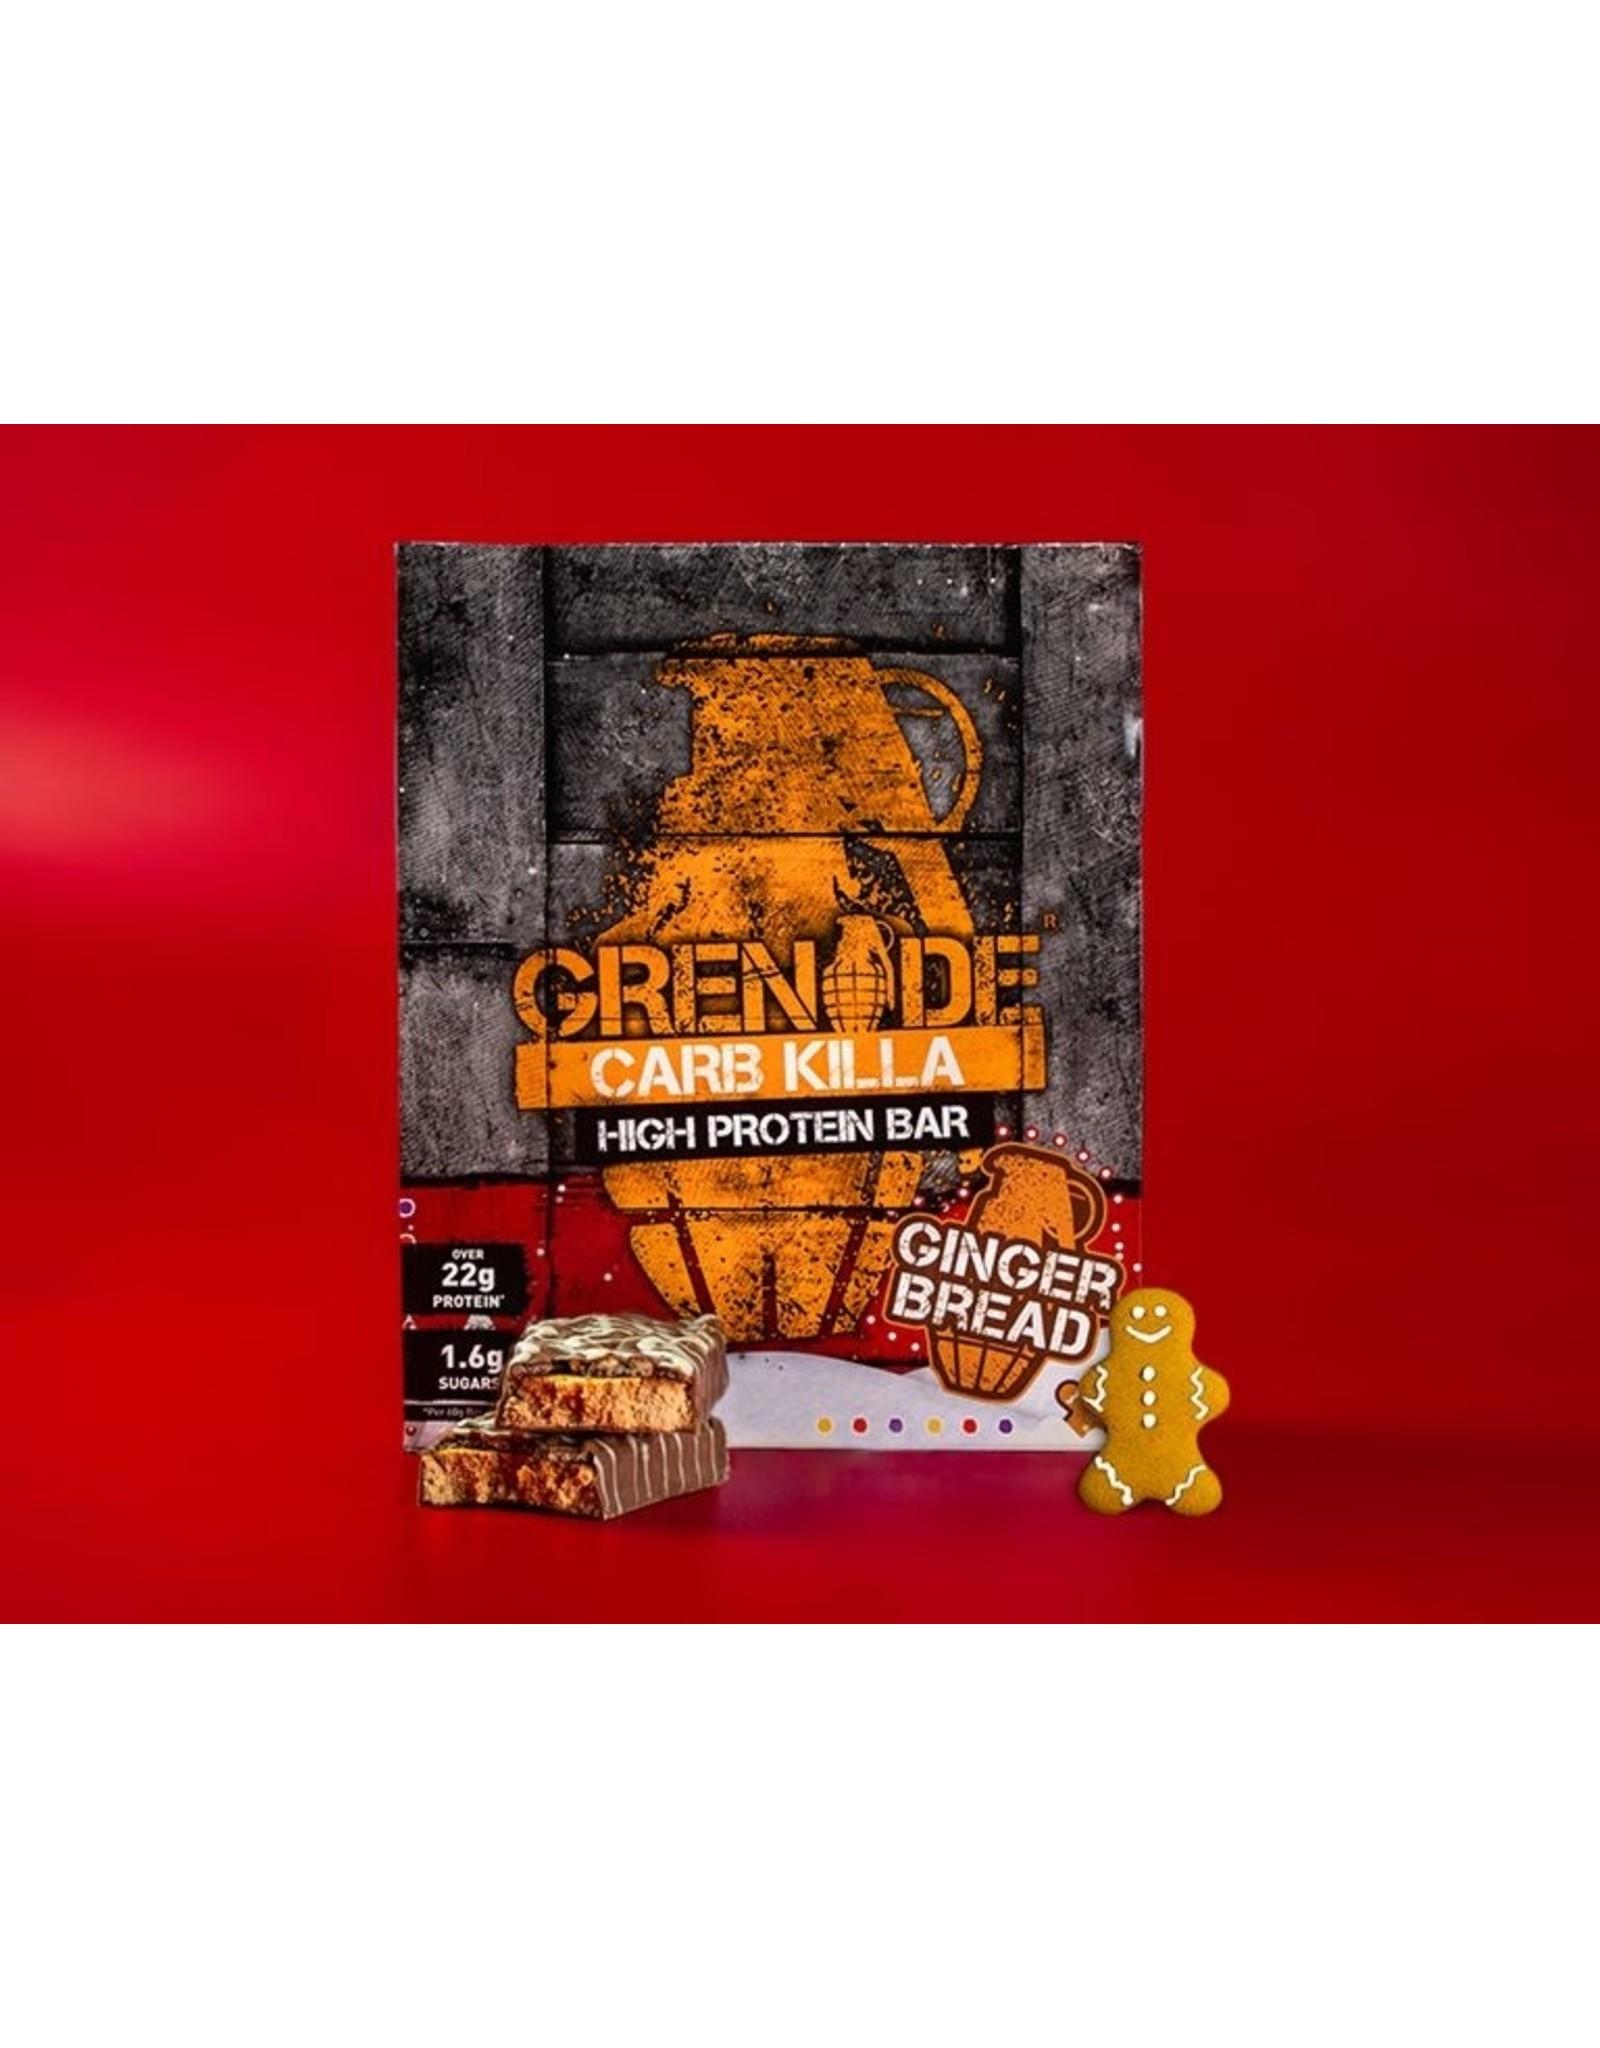 Grenade Carb Killa Protein bar - Limited Edition